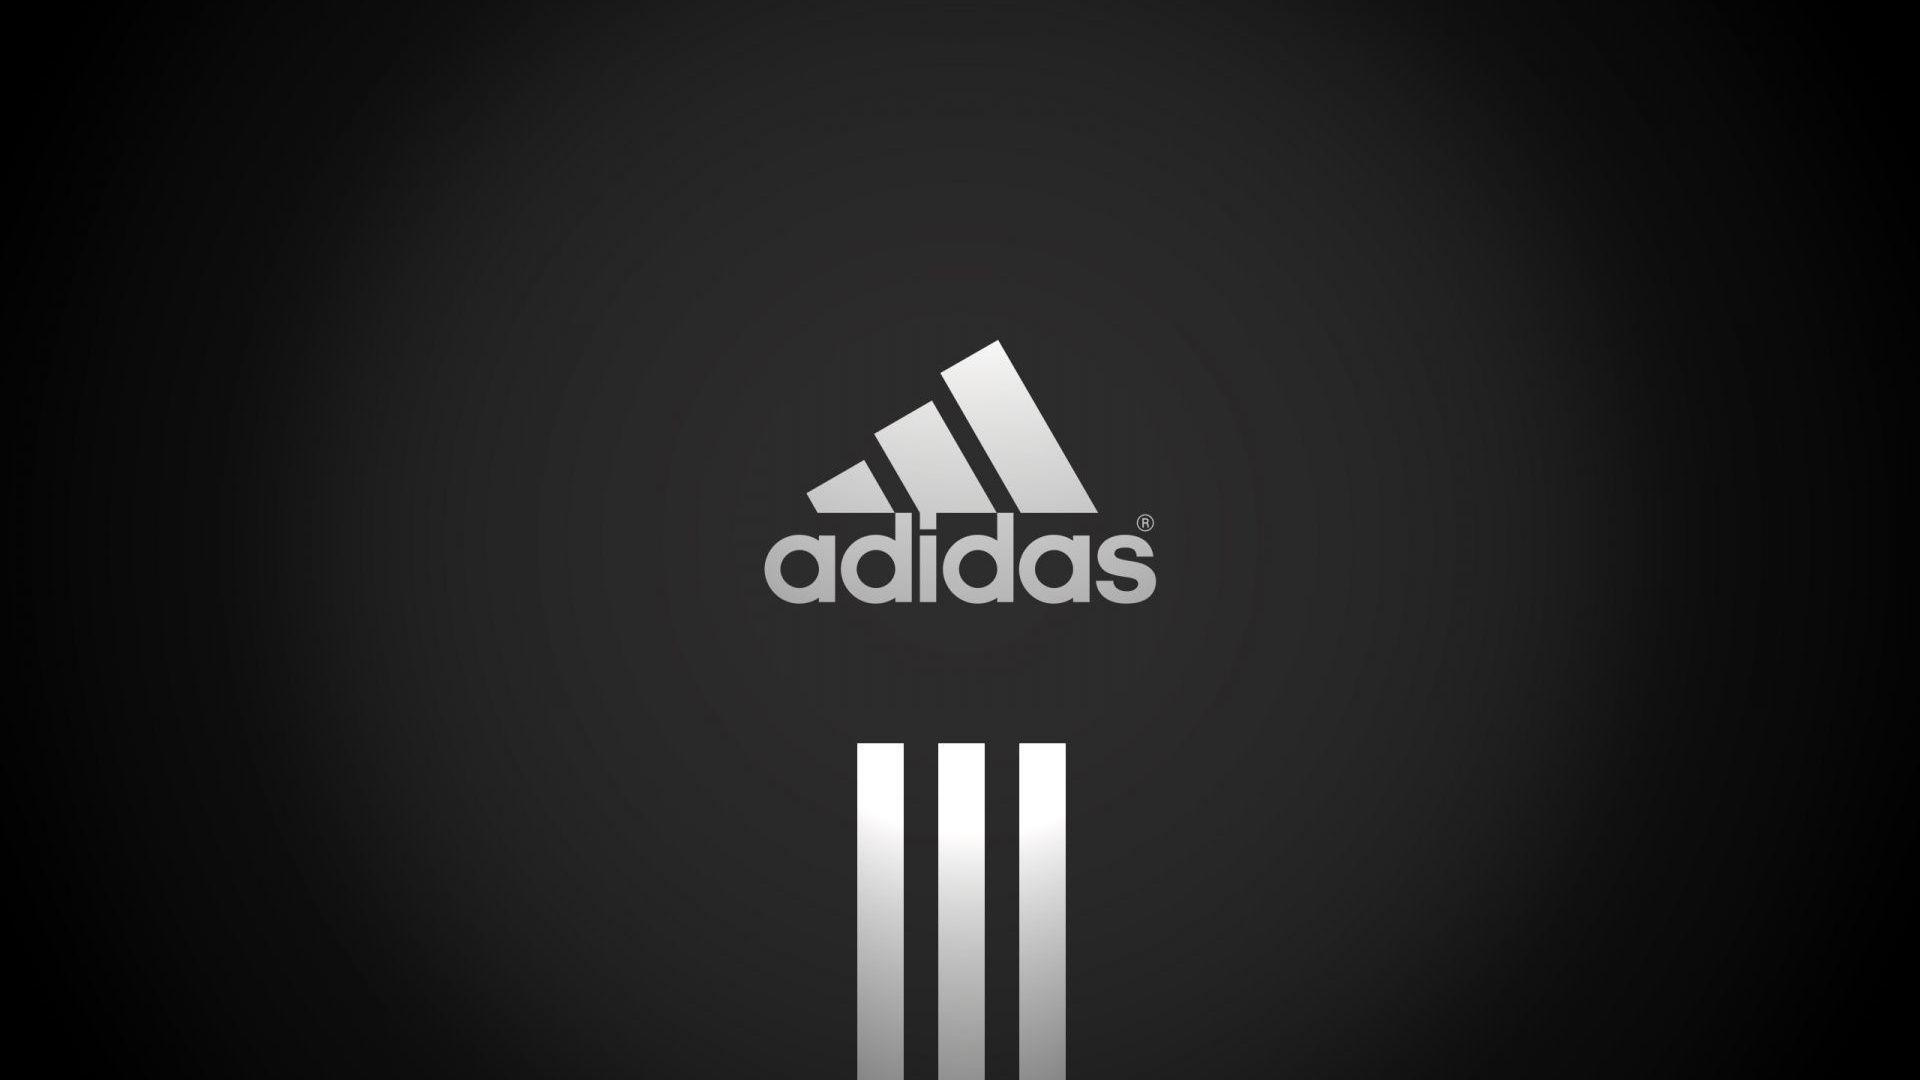 adidas screensavers, adidas wallpaper iphone